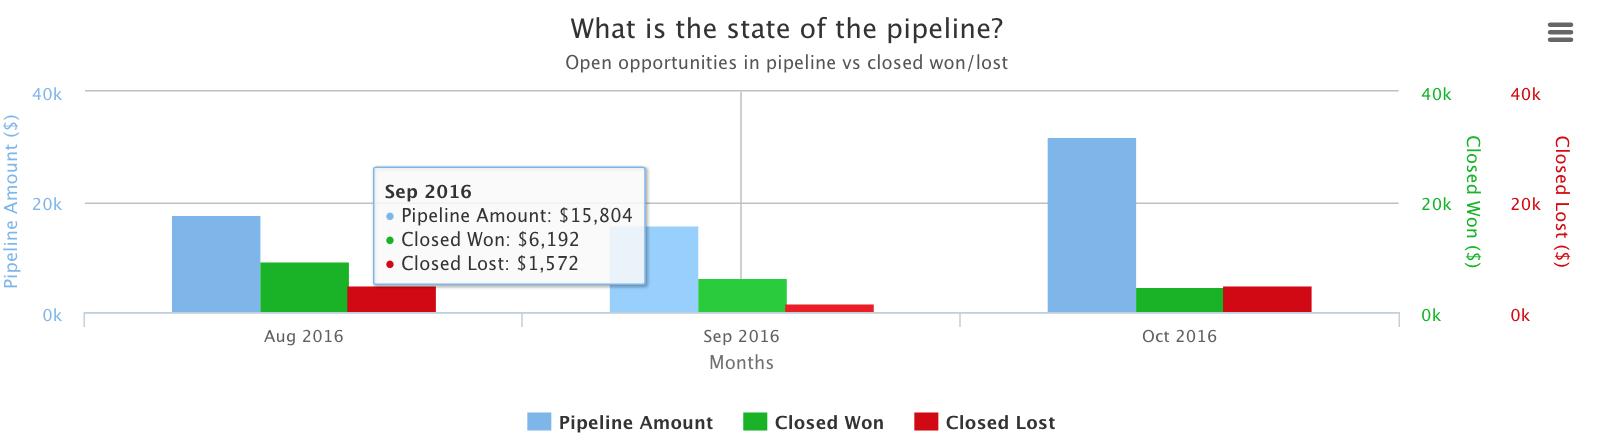 pipeline_value_chart